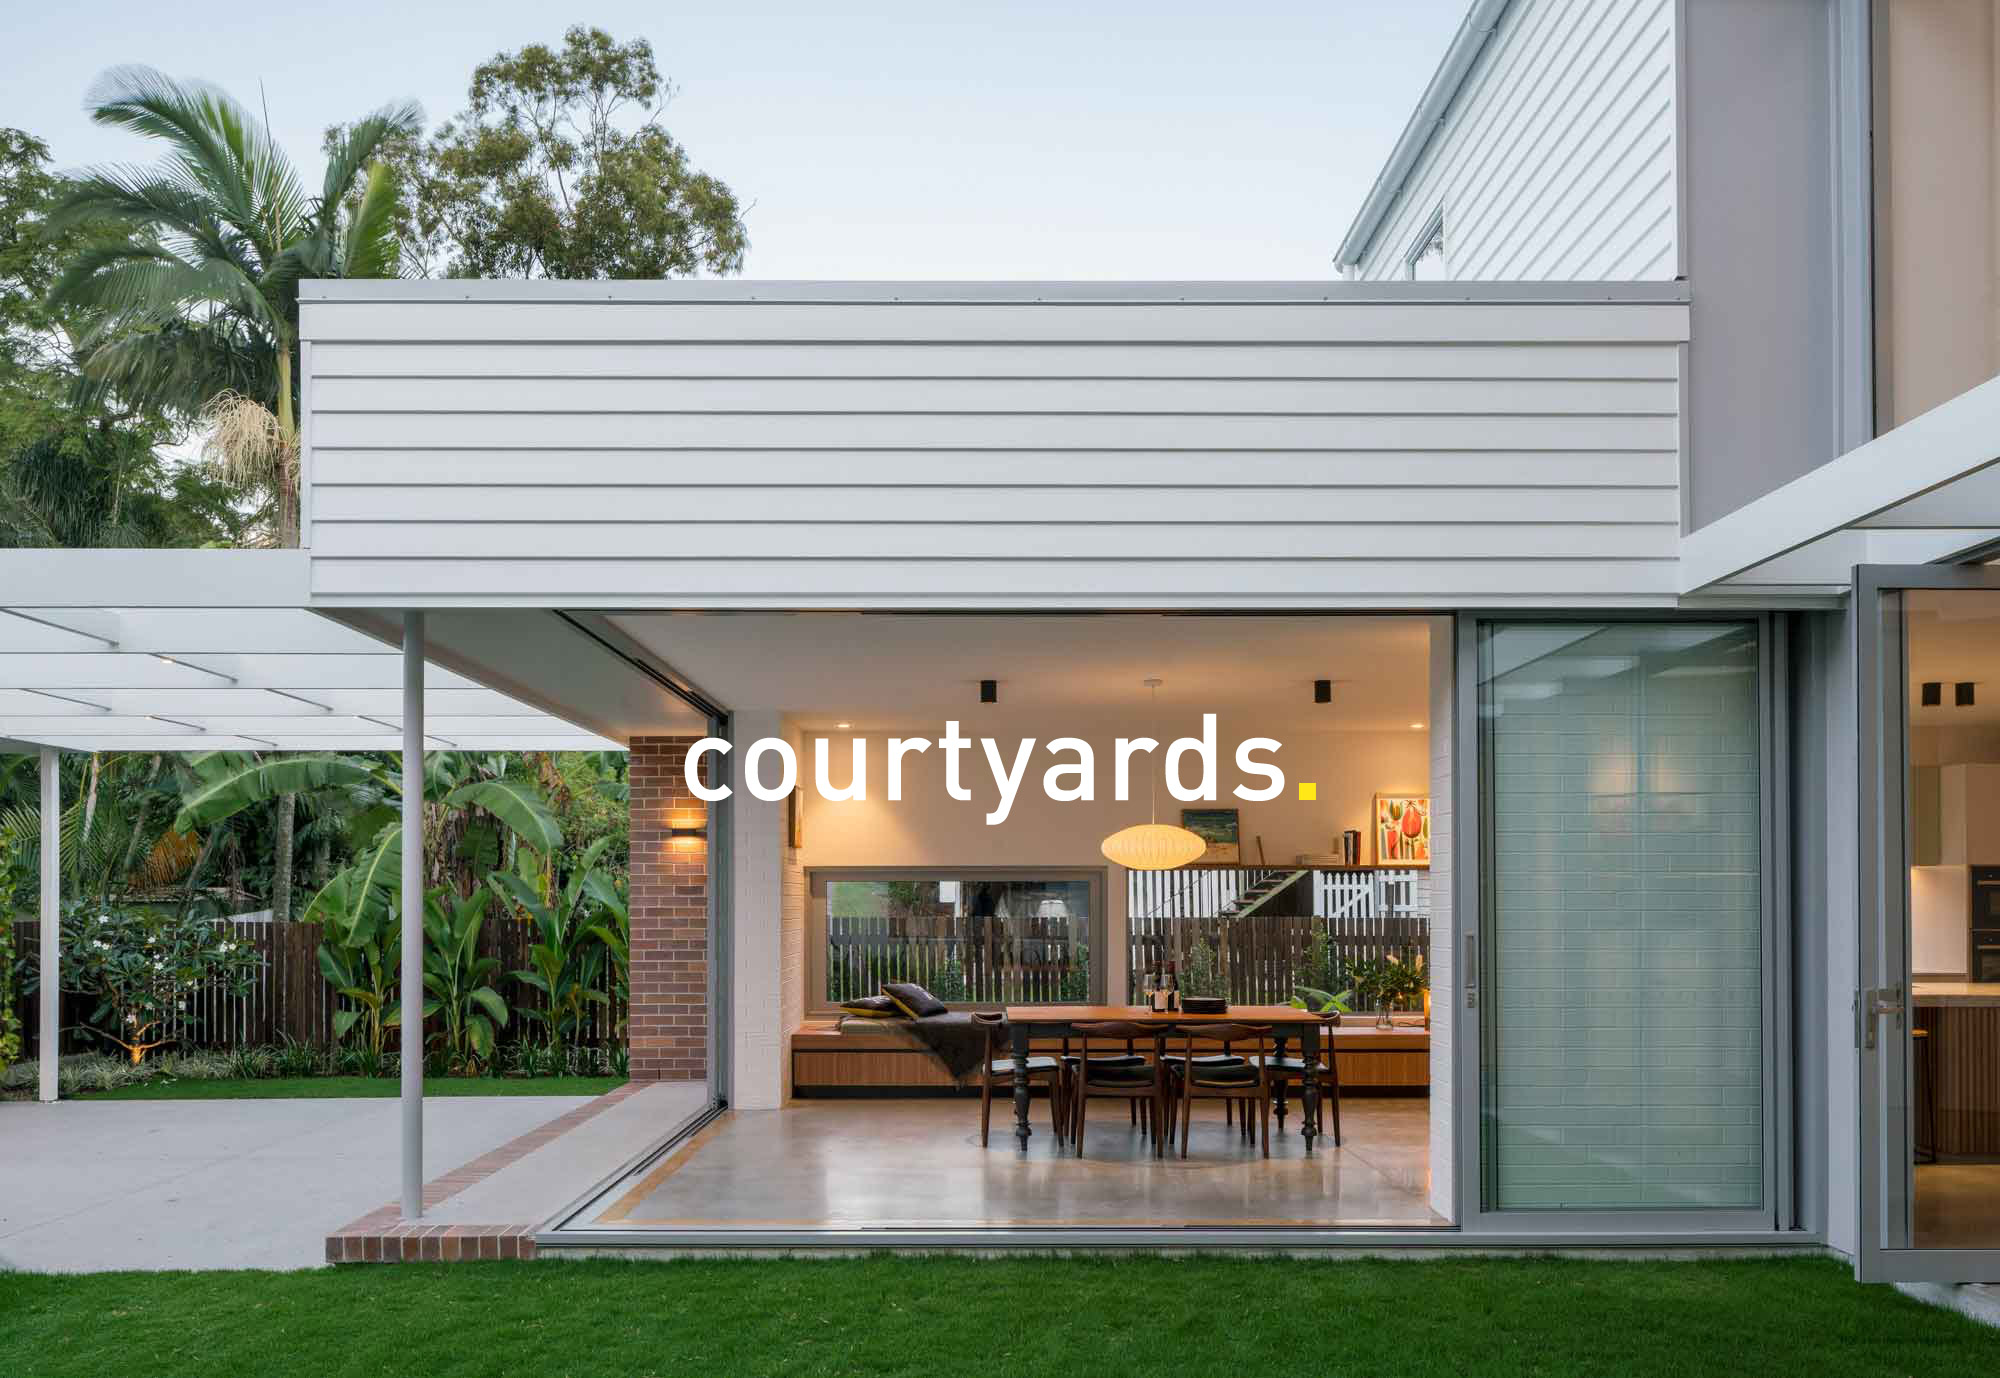 courtyards_01.jpg